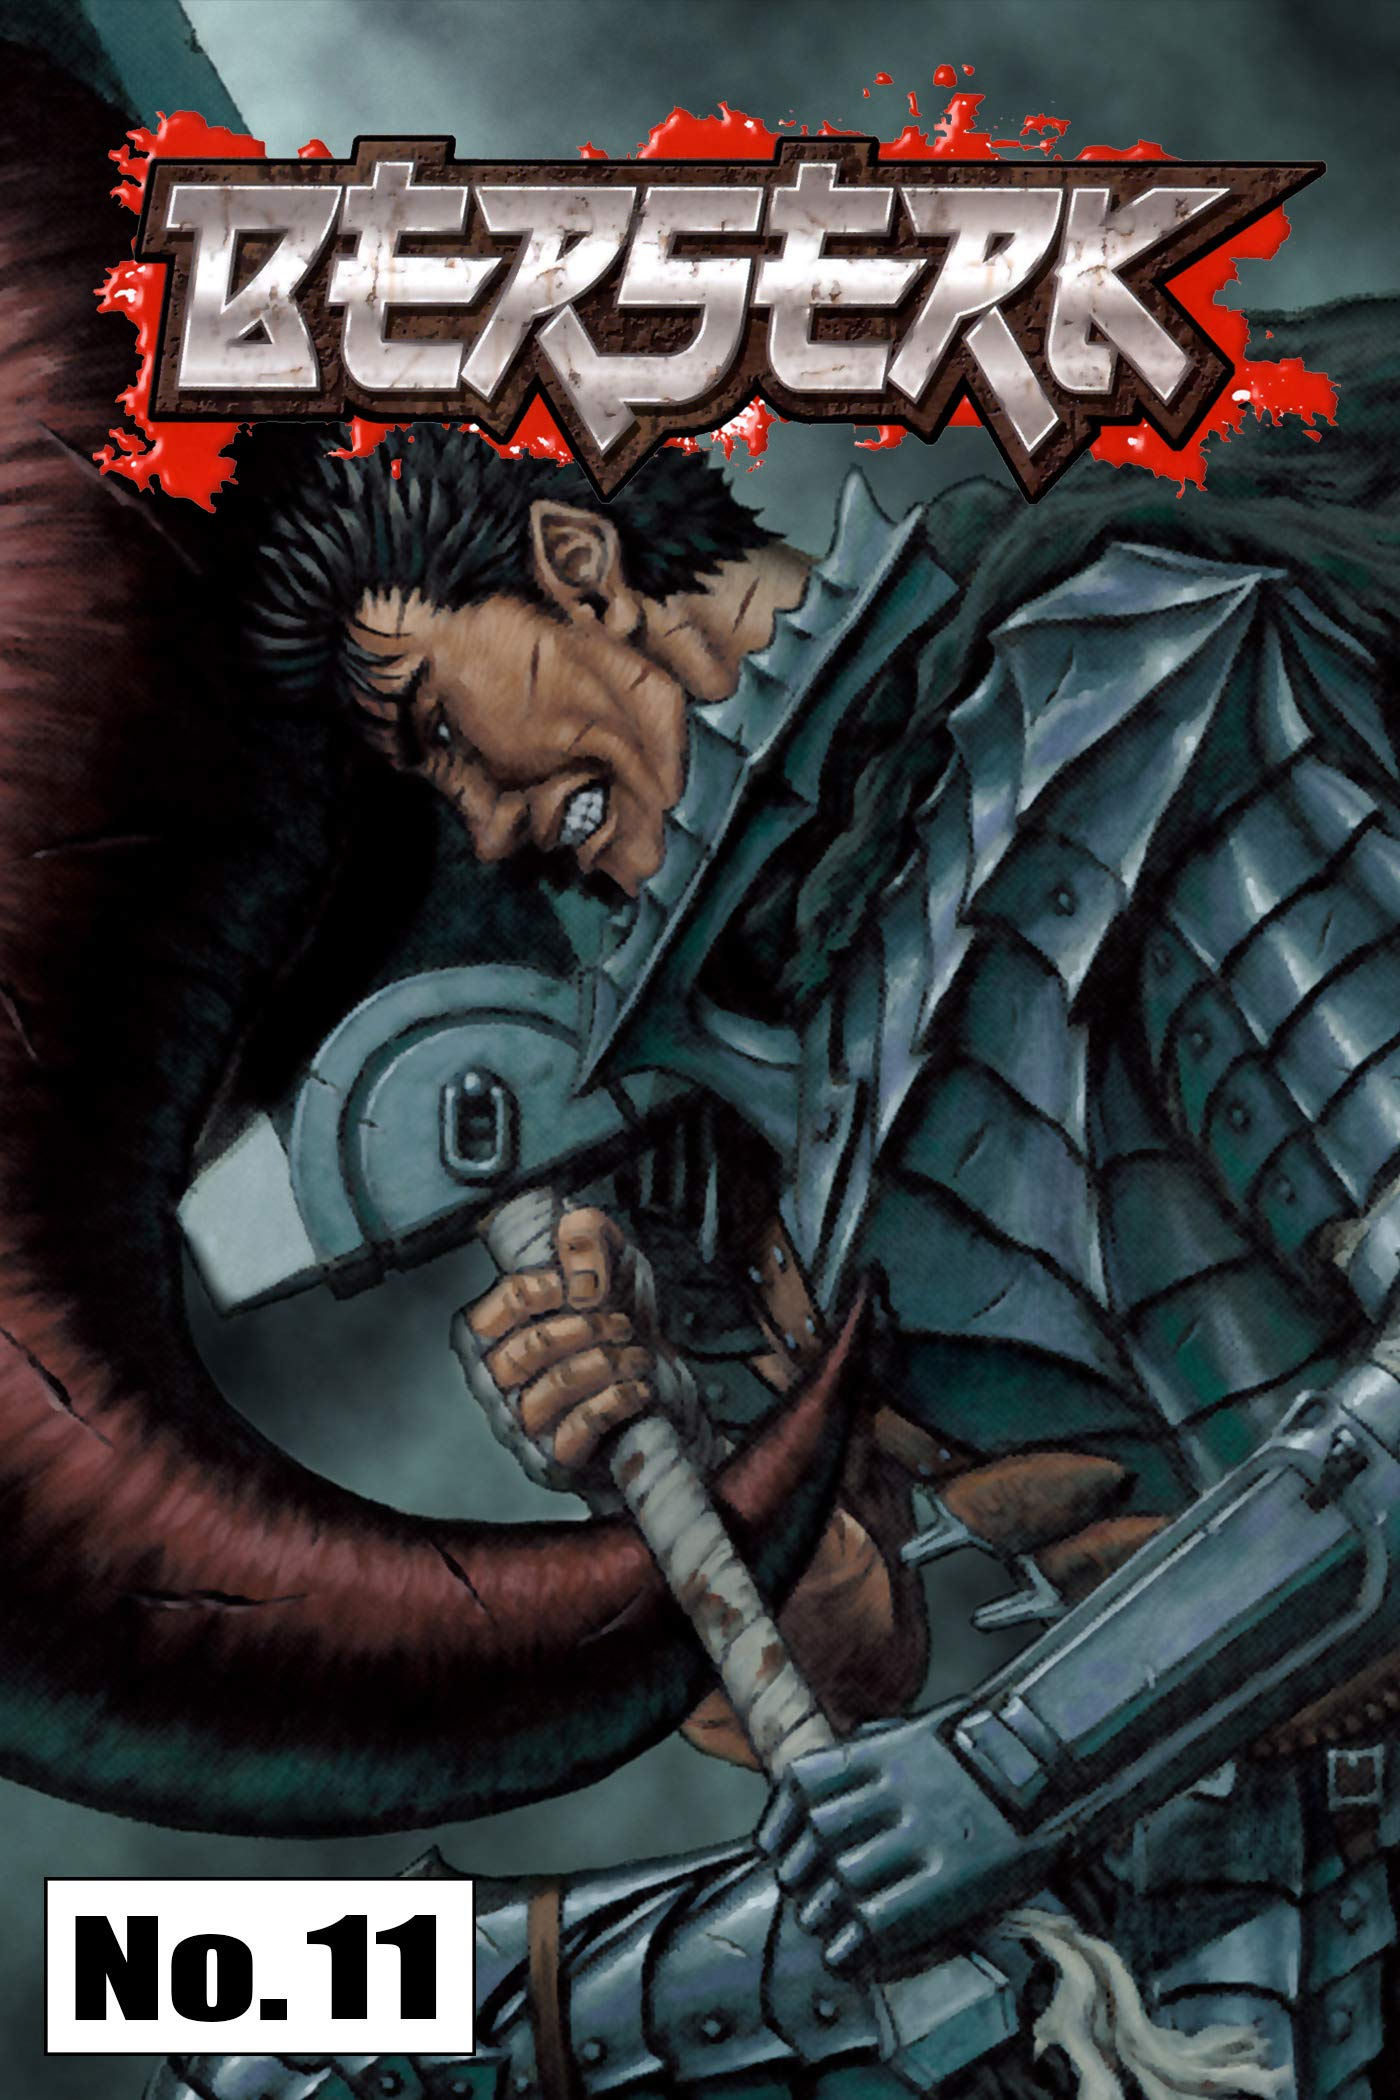 Best Fantasy Collection Manga: Berserk No 11